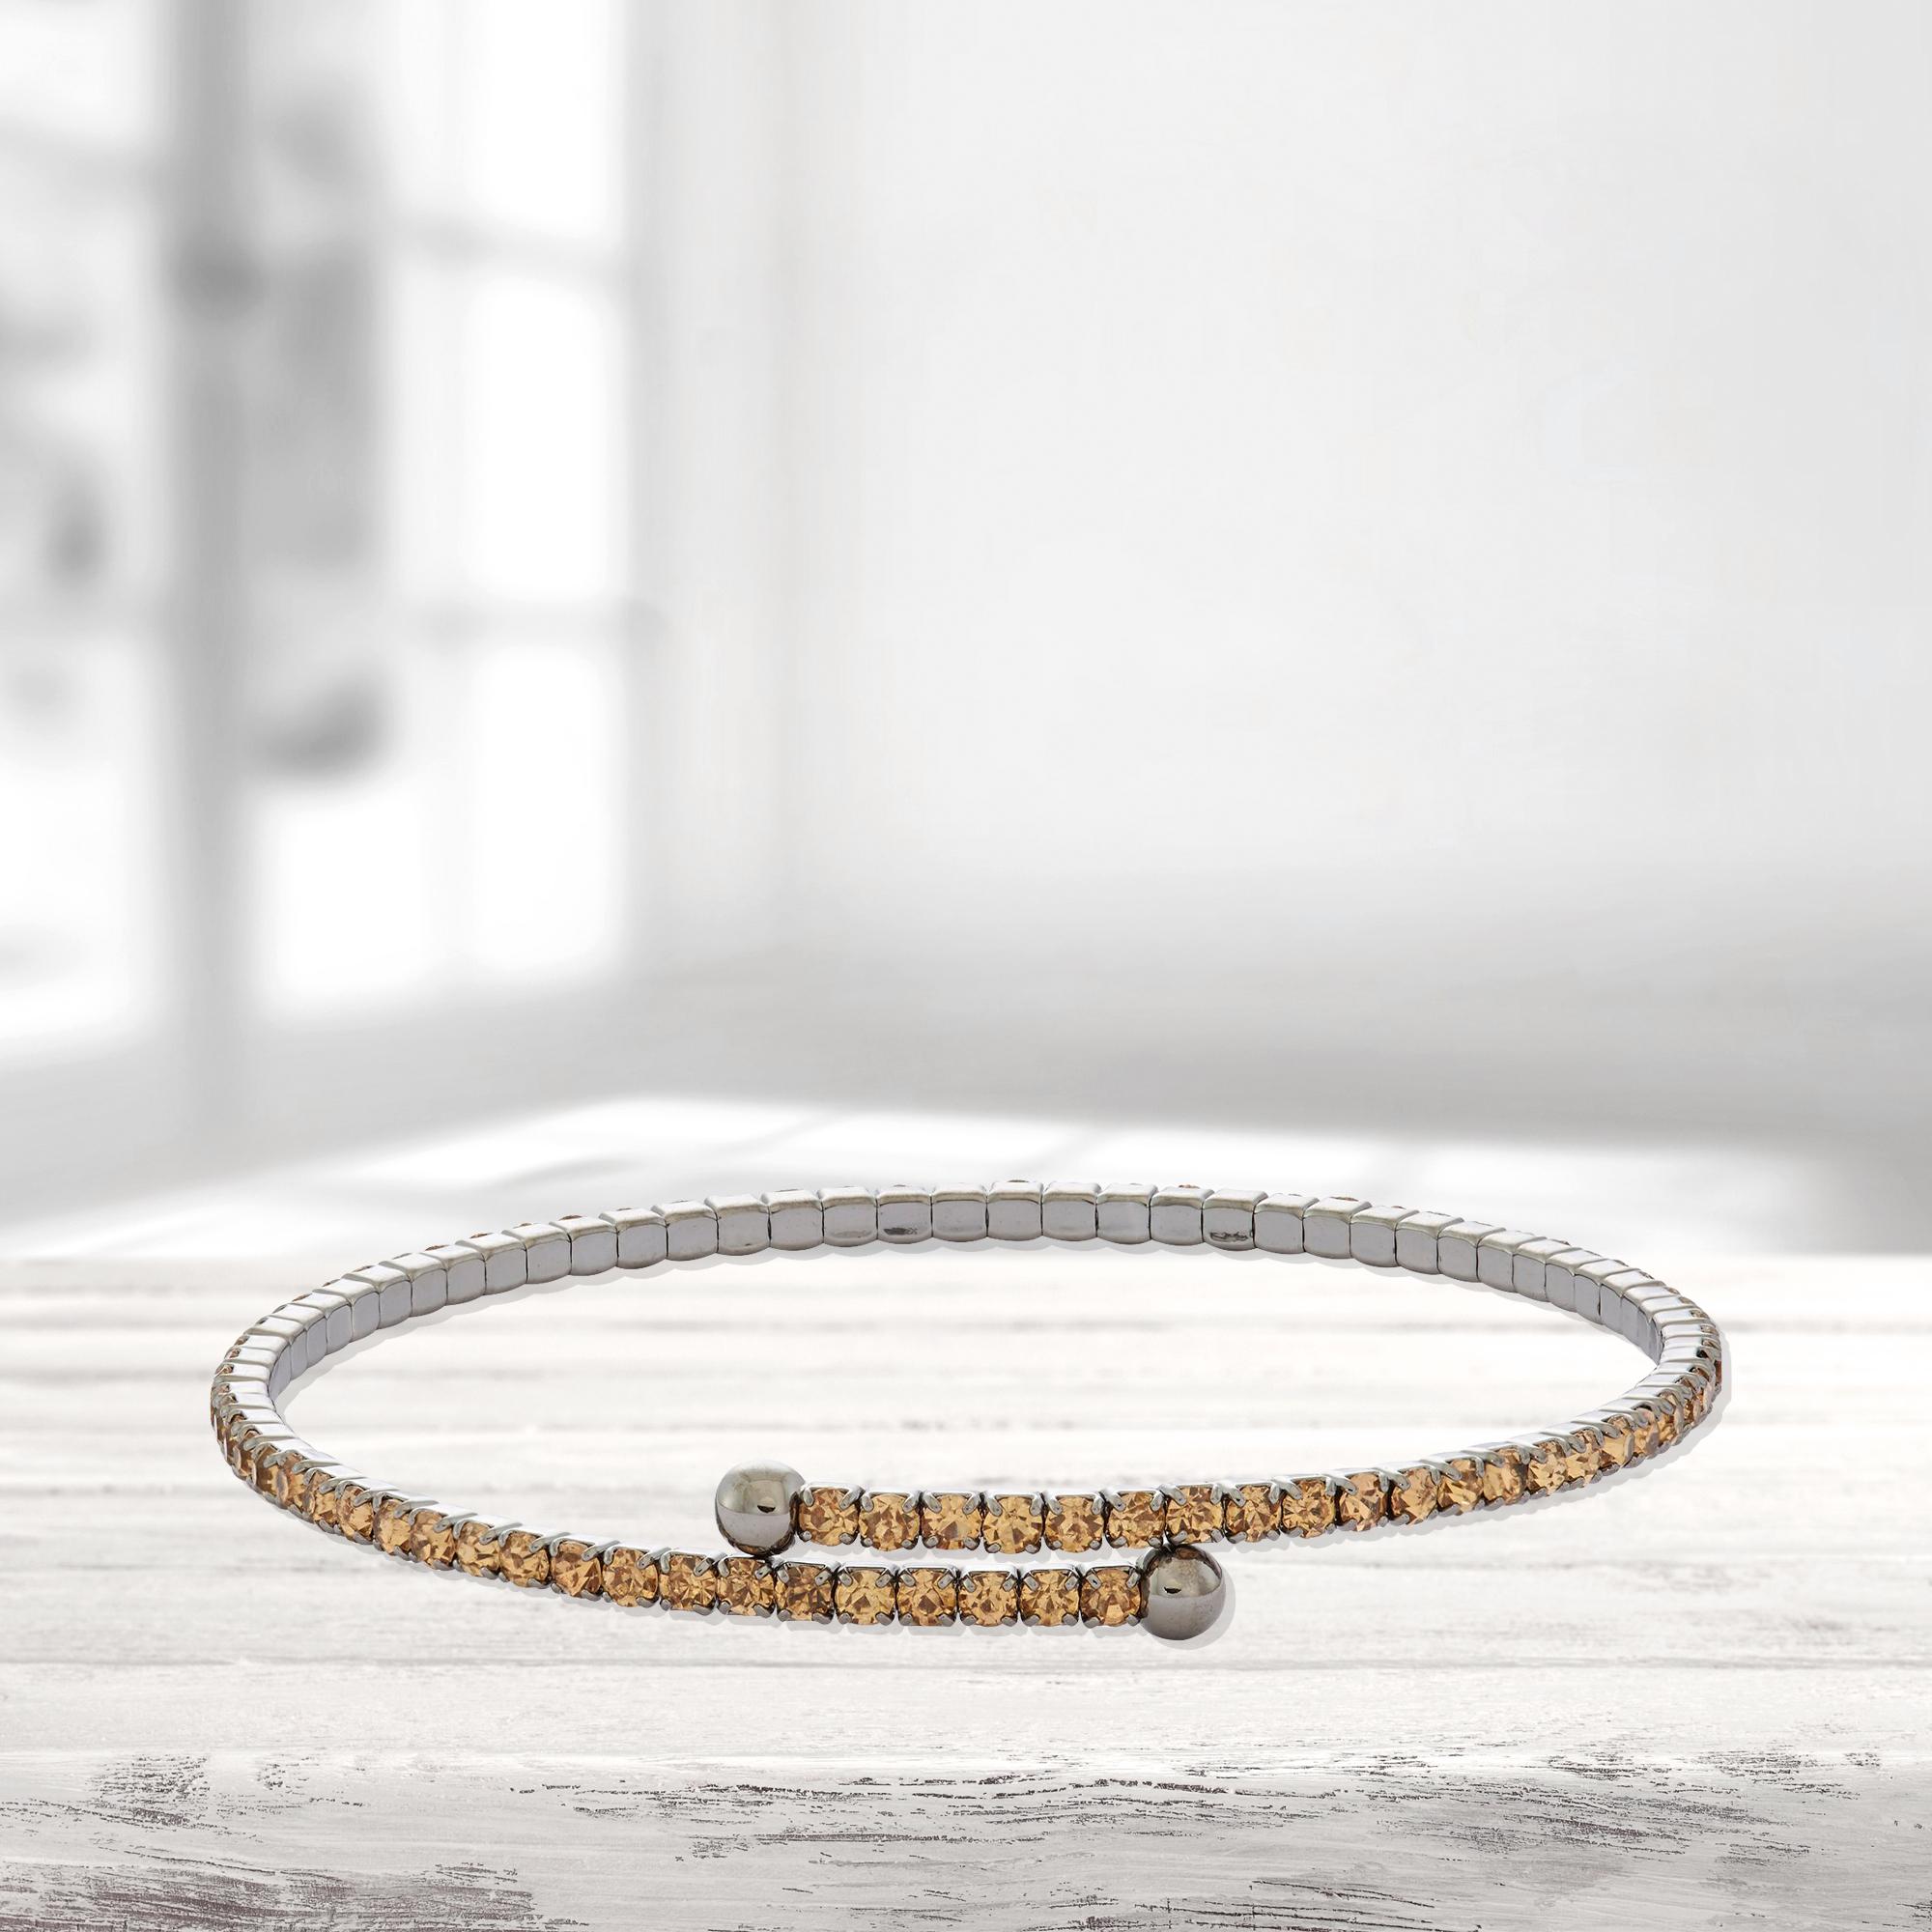 Womens-Ladies-Fashion-Accessories-Jewelry-Black-Rhodium-Plated-Bangle-Bracelet thumbnail 31